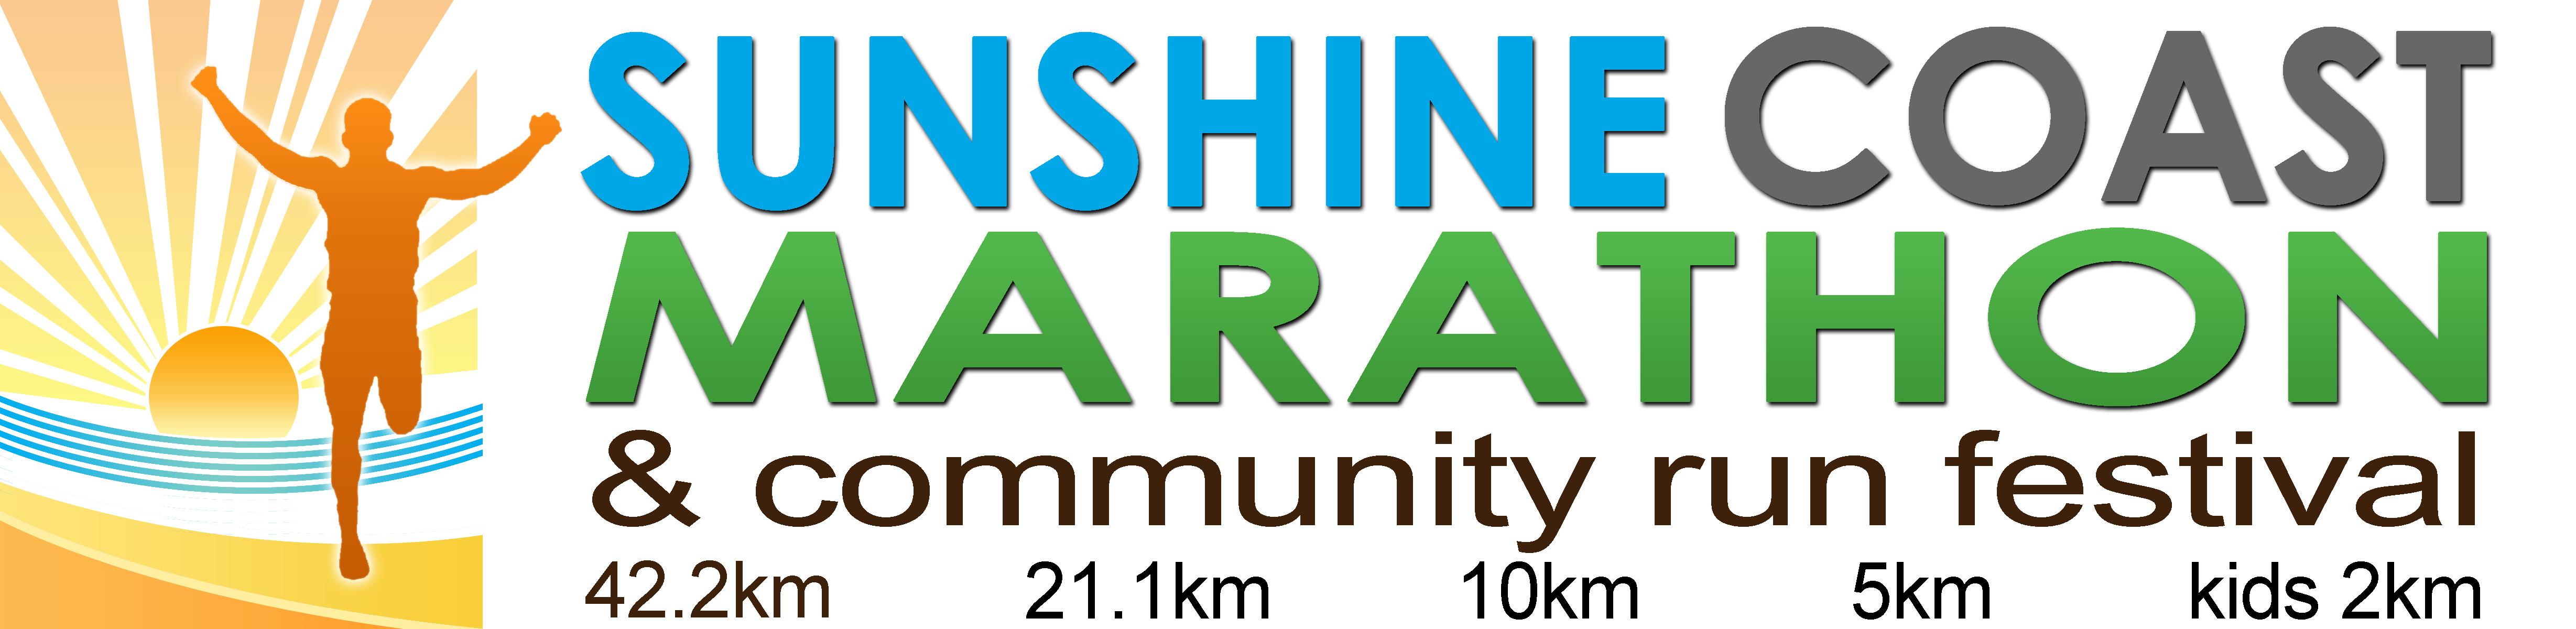 Sunshine Coast Marathon & Community Run Festival 2012